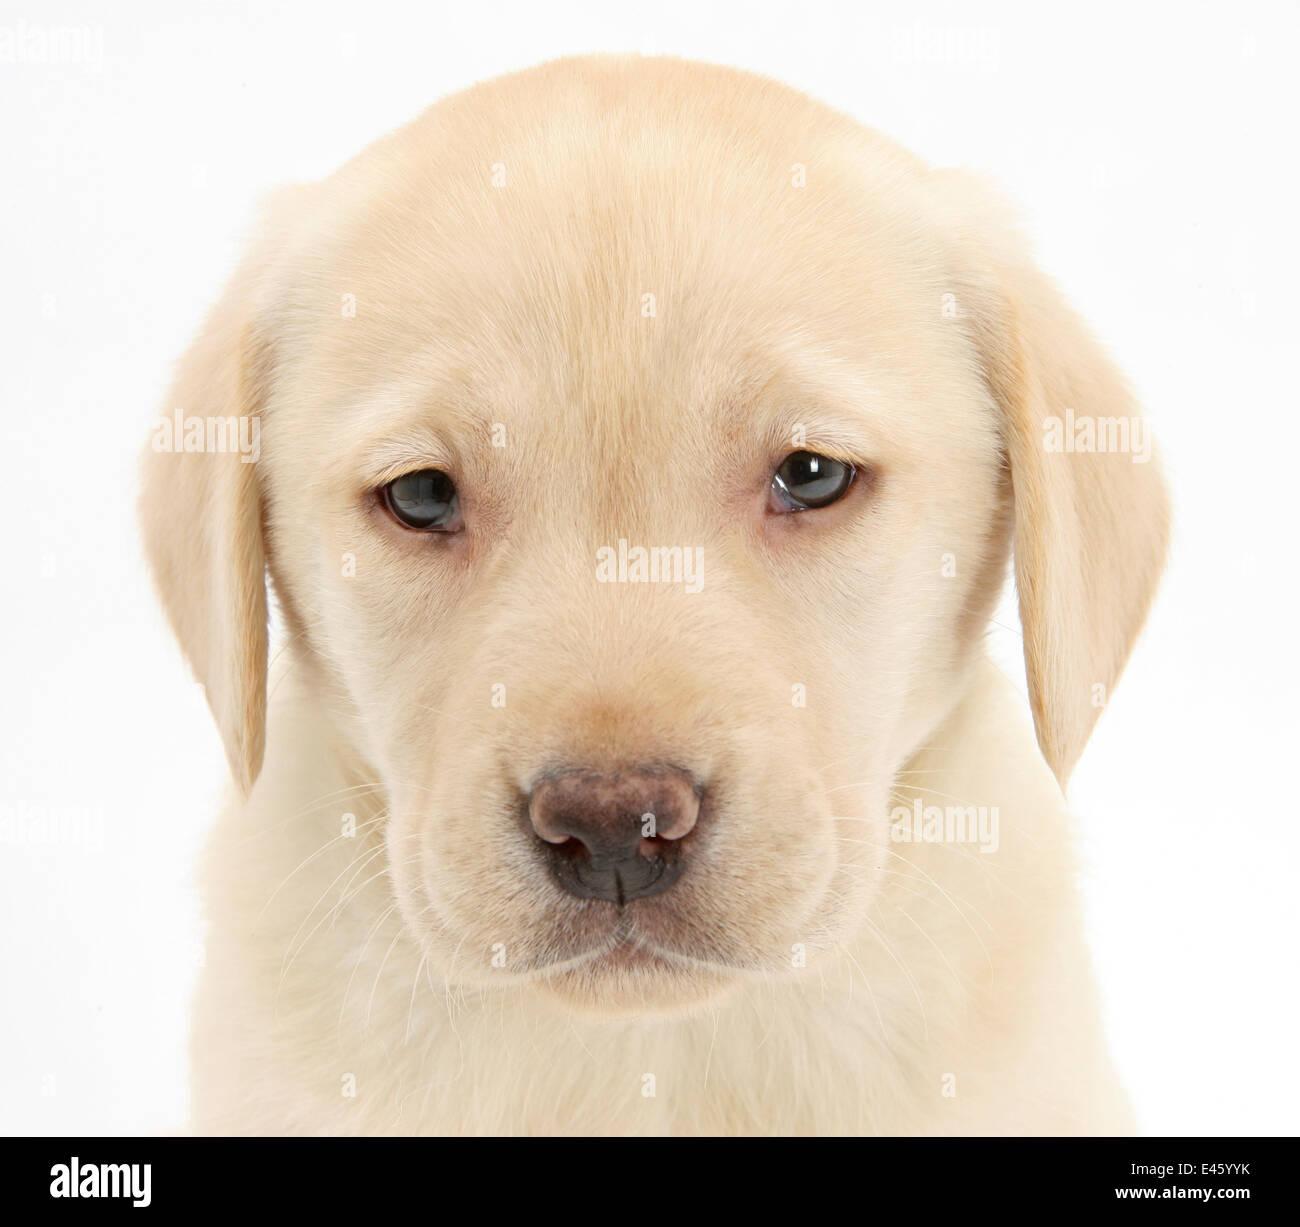 Yellow Labrador Retriever puppy, 7 weeks. - Stock Image